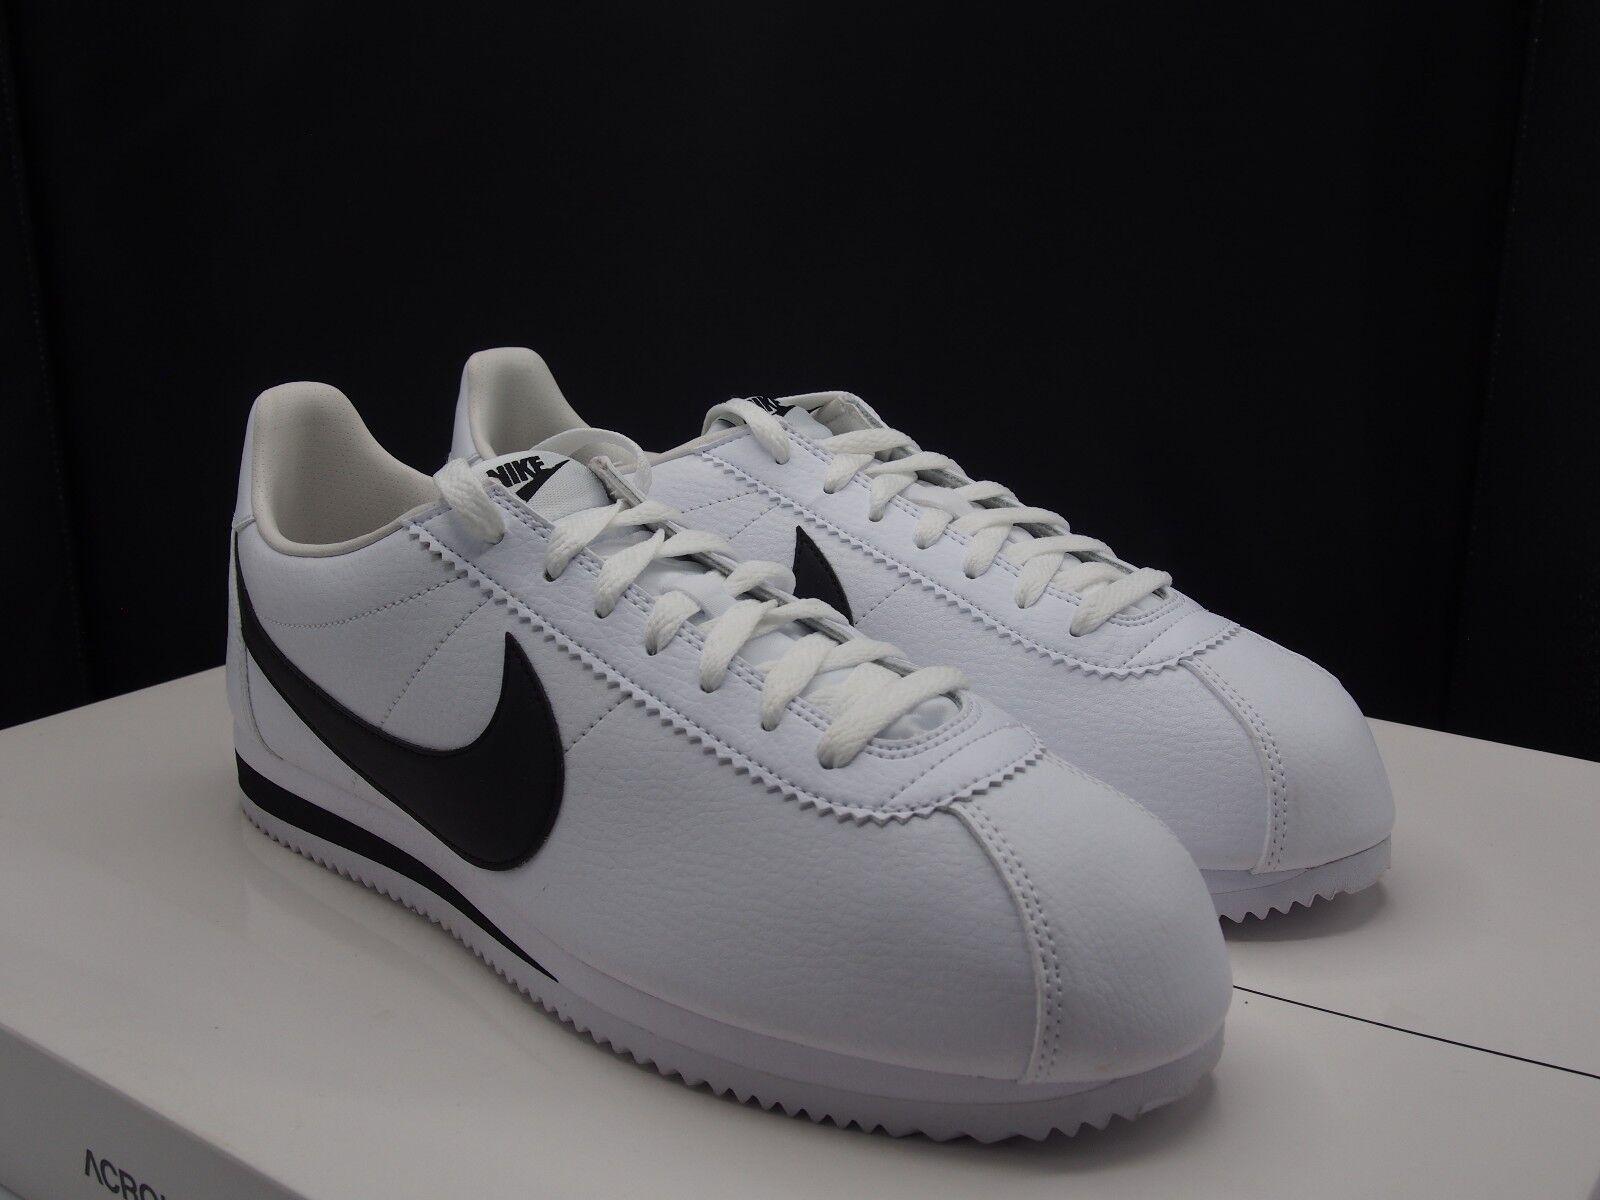 Nike cortez leder  / 749571-100 schwarz 749571-100 / classic ee7b35